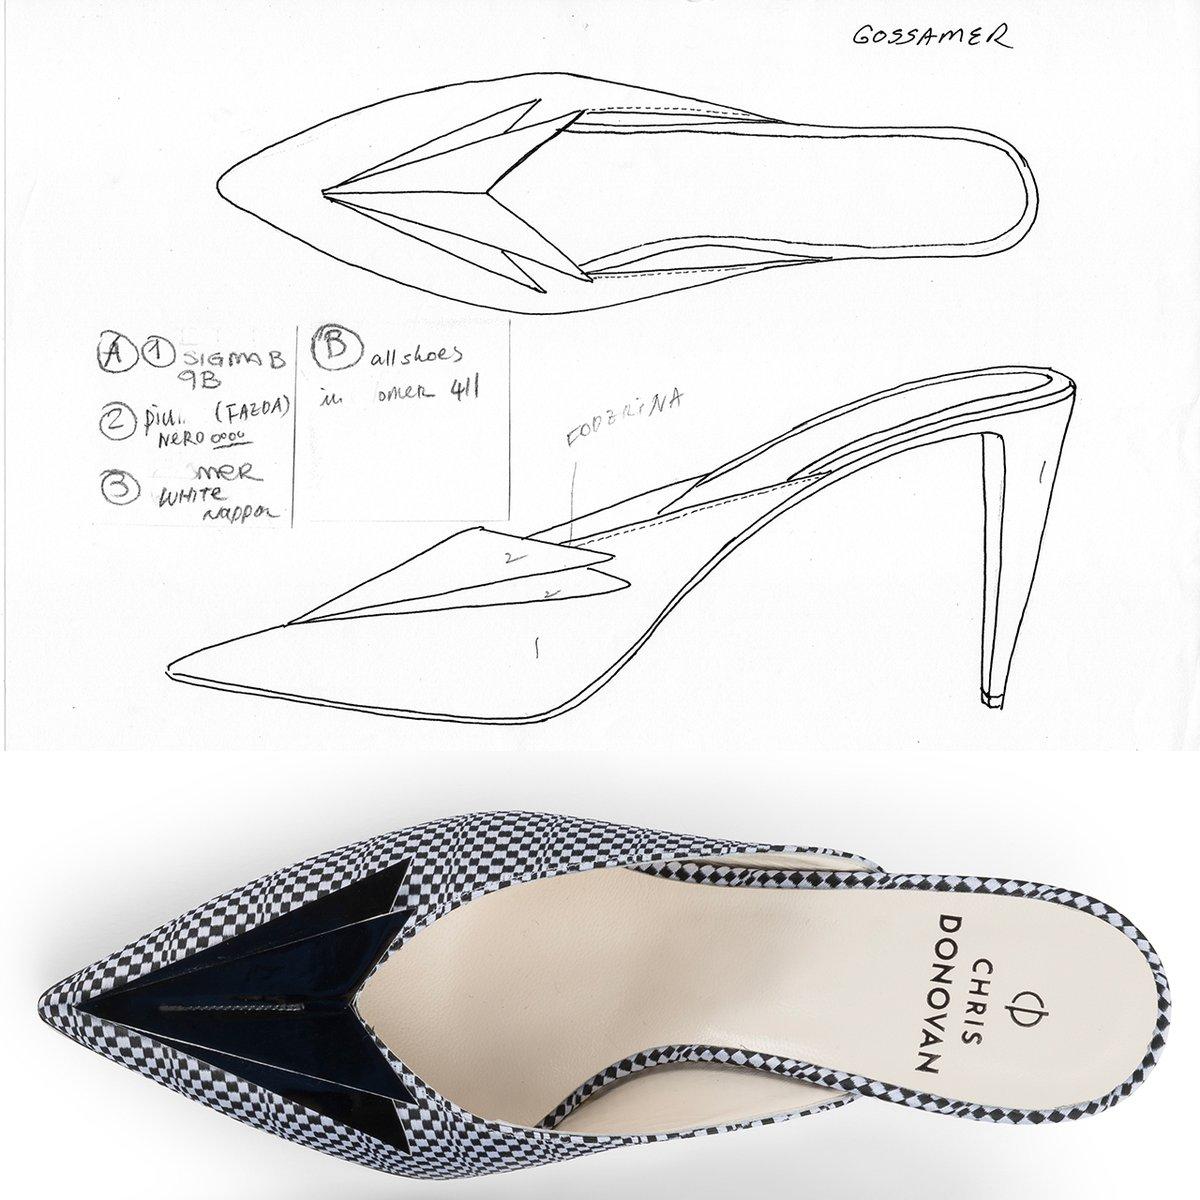 From sketch to shoe. Coming Soon at http://ChrisDonovanFootwear.com  #heels #flight #fashionista #shoesaddict #Shoespic.twitter.com/VW09i5nQVh